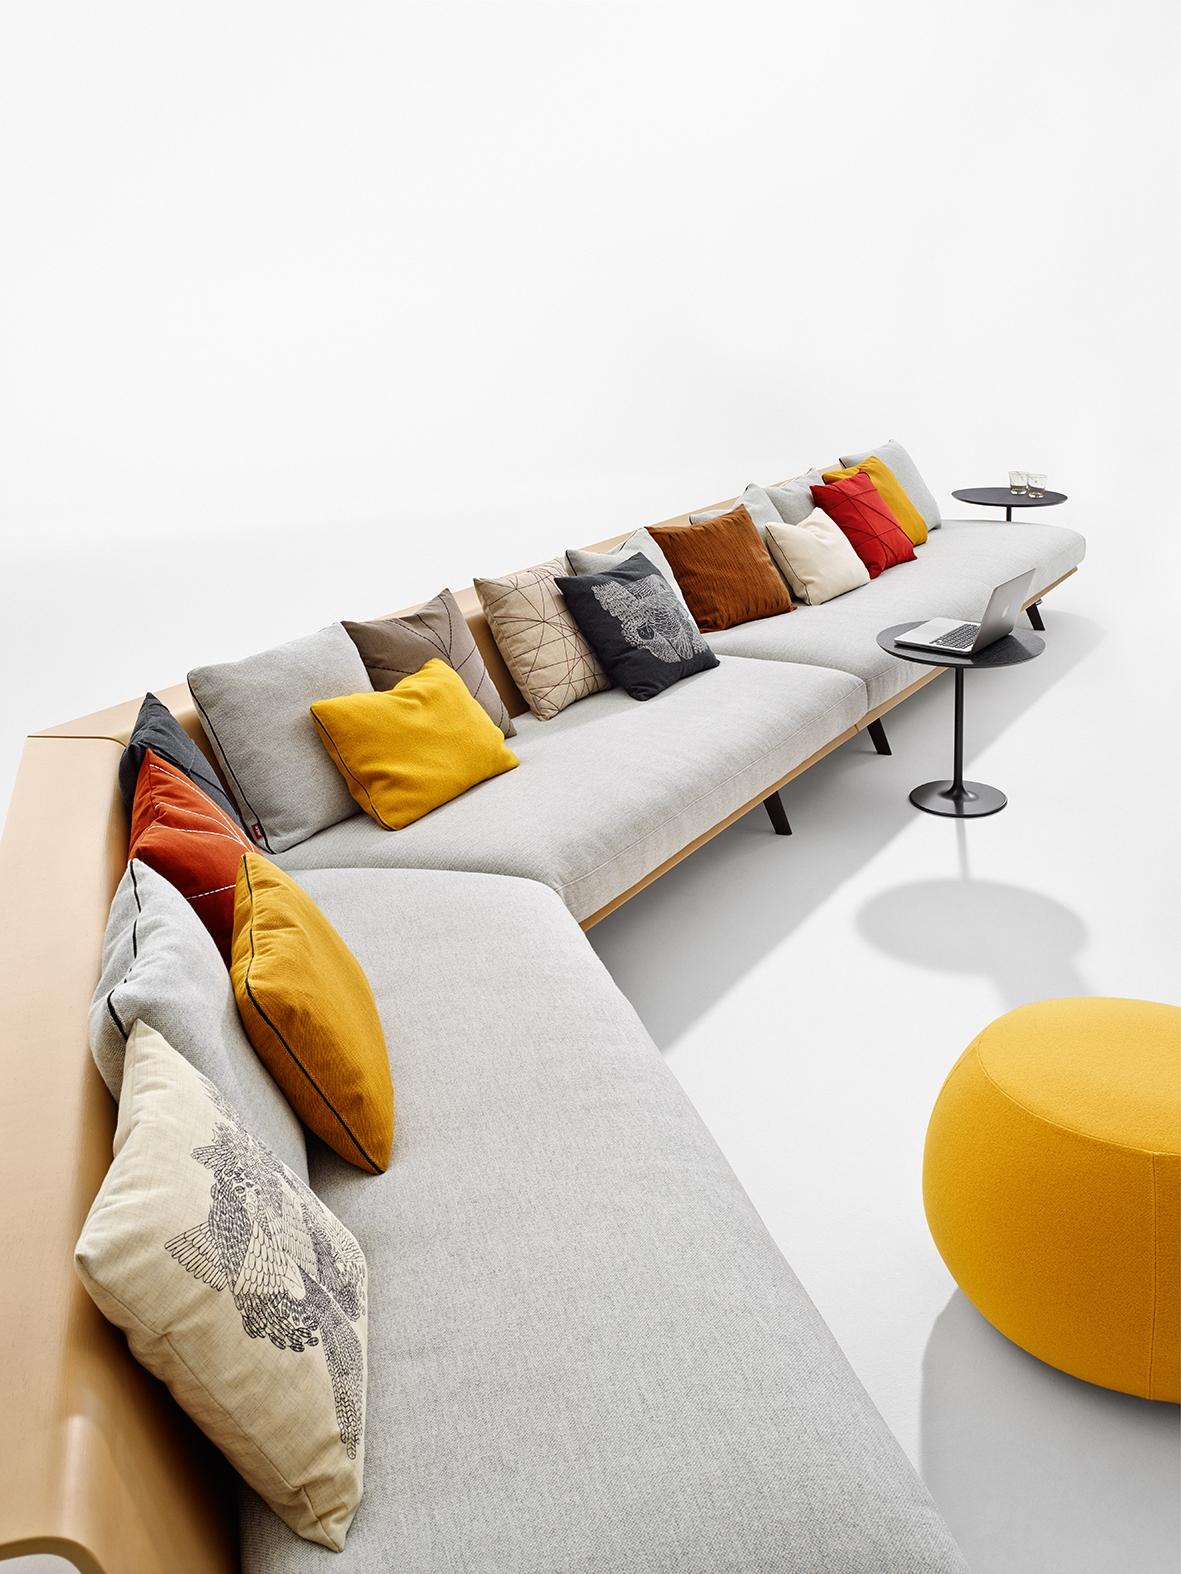 Arper_Zinta_Lounge_sofa_modular_MarcoCovi_4424+4425+4420_2.jpg